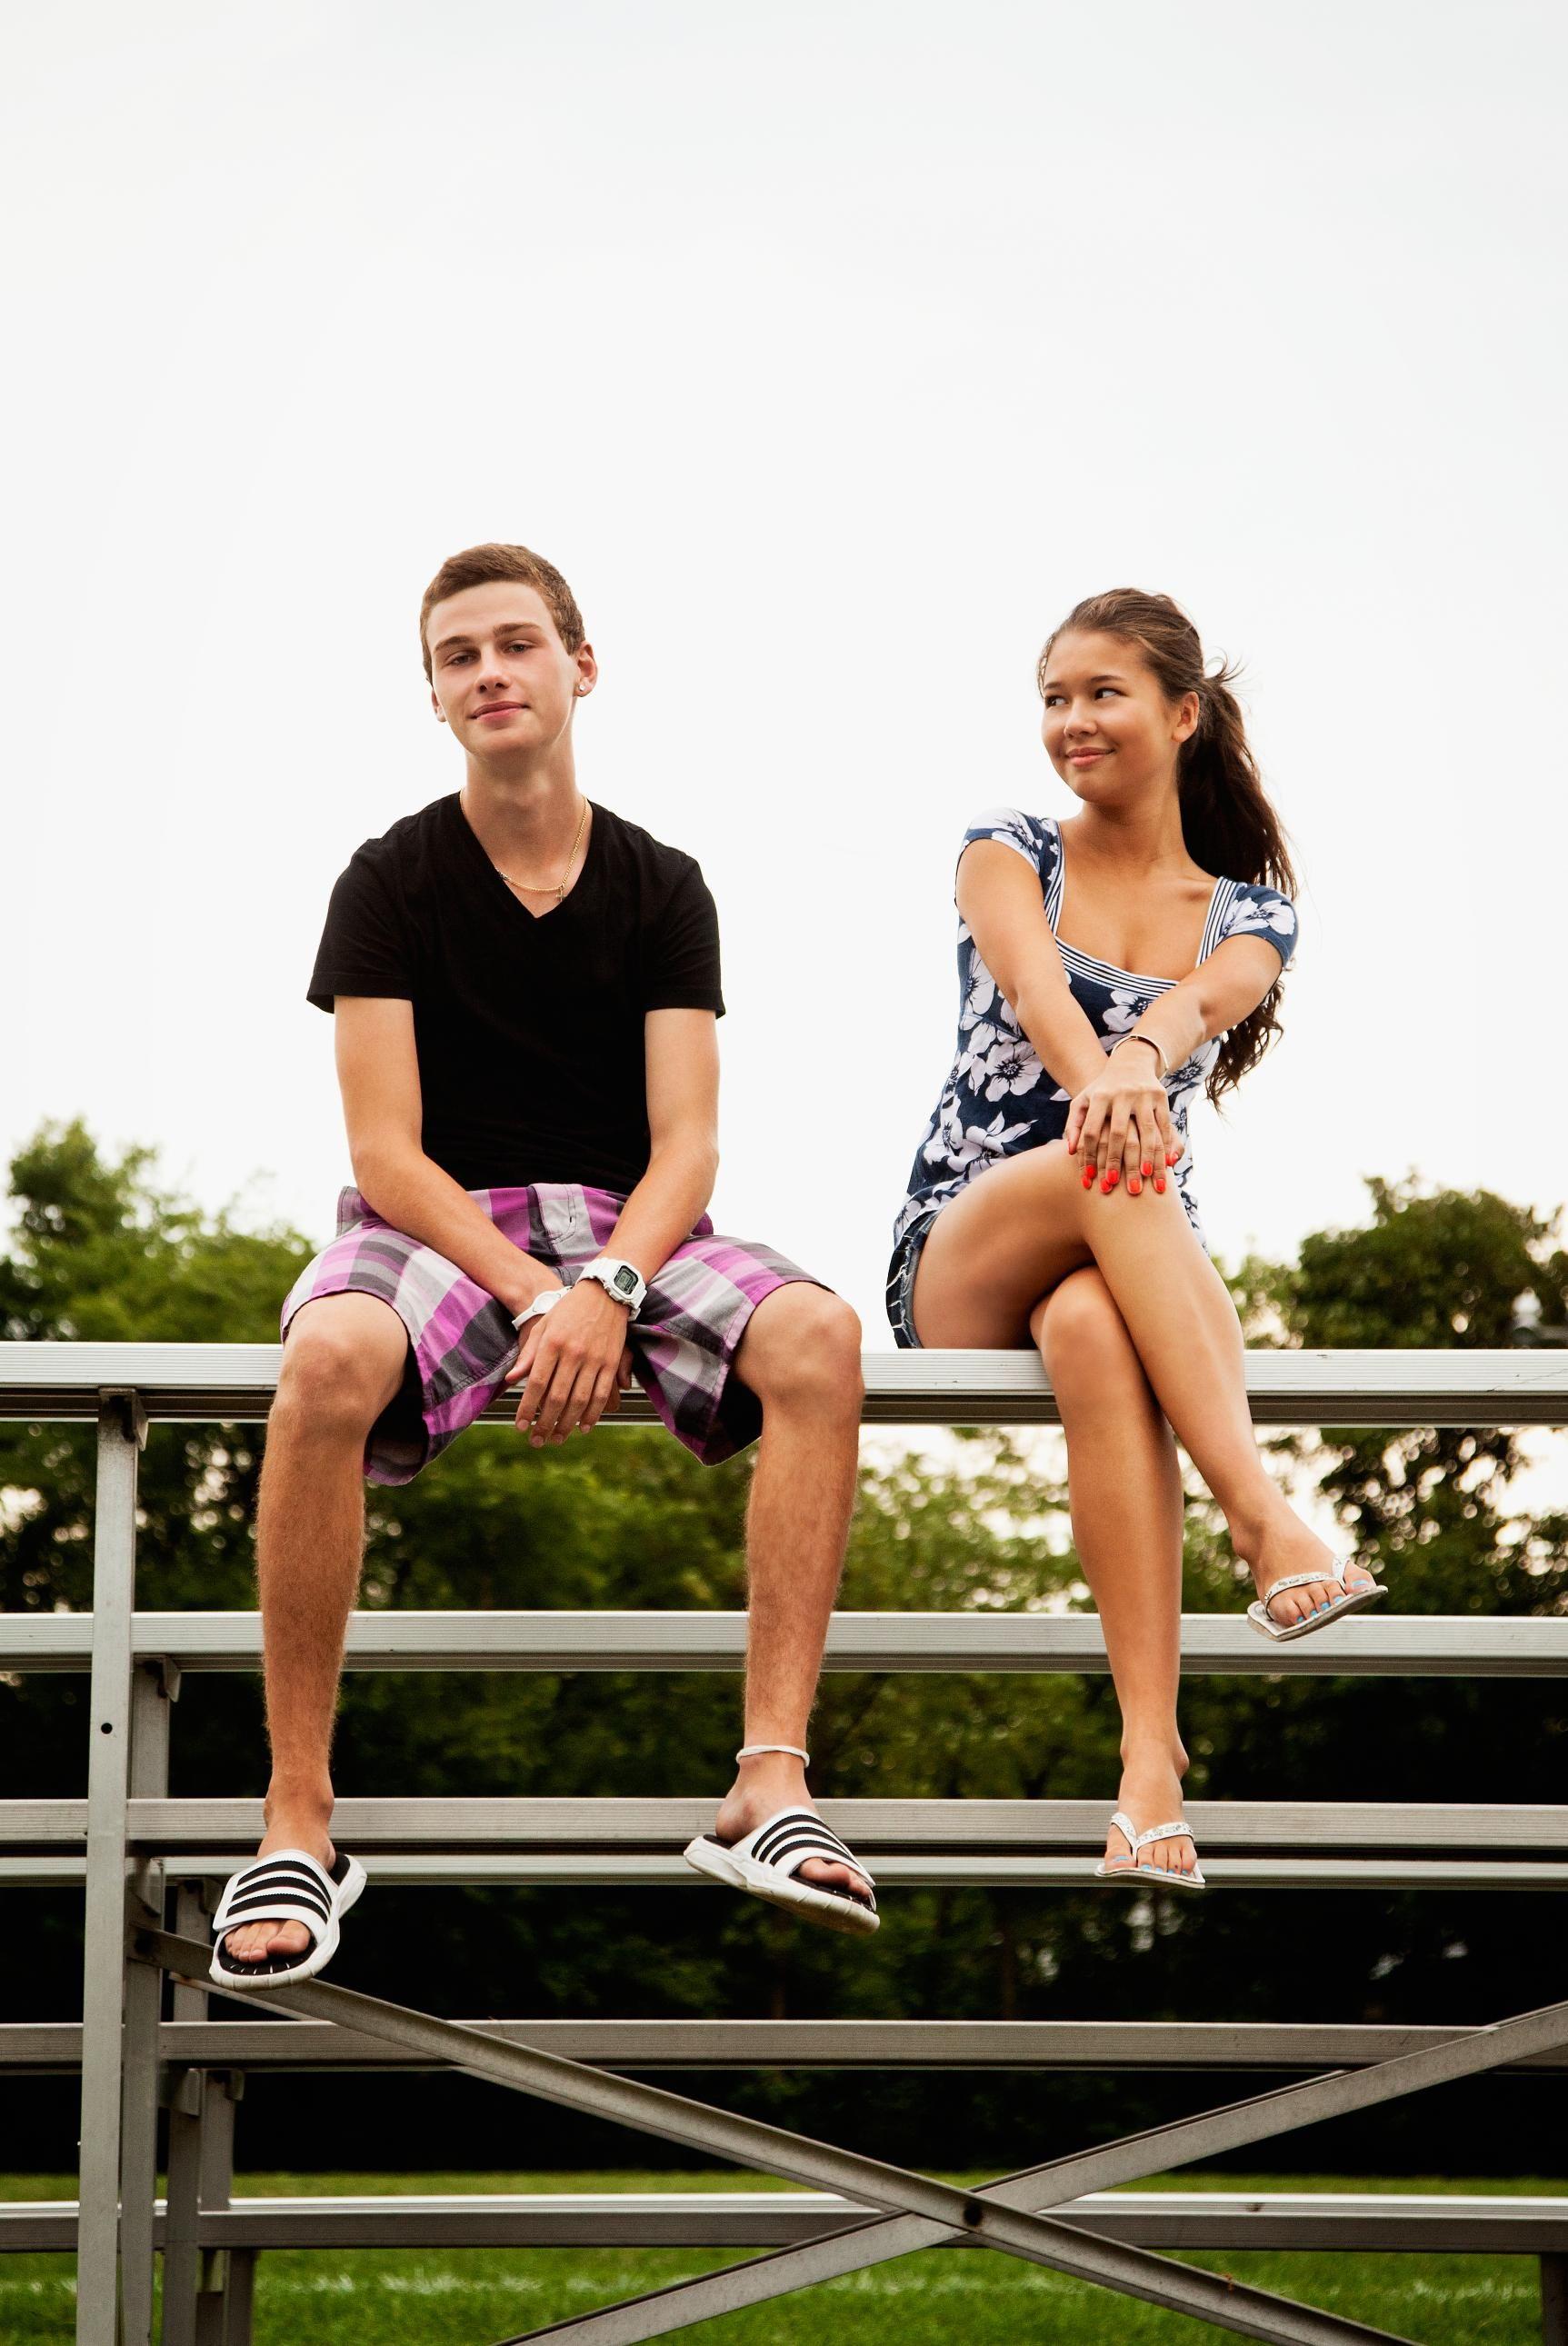 Free Best Online Teen Dating Site